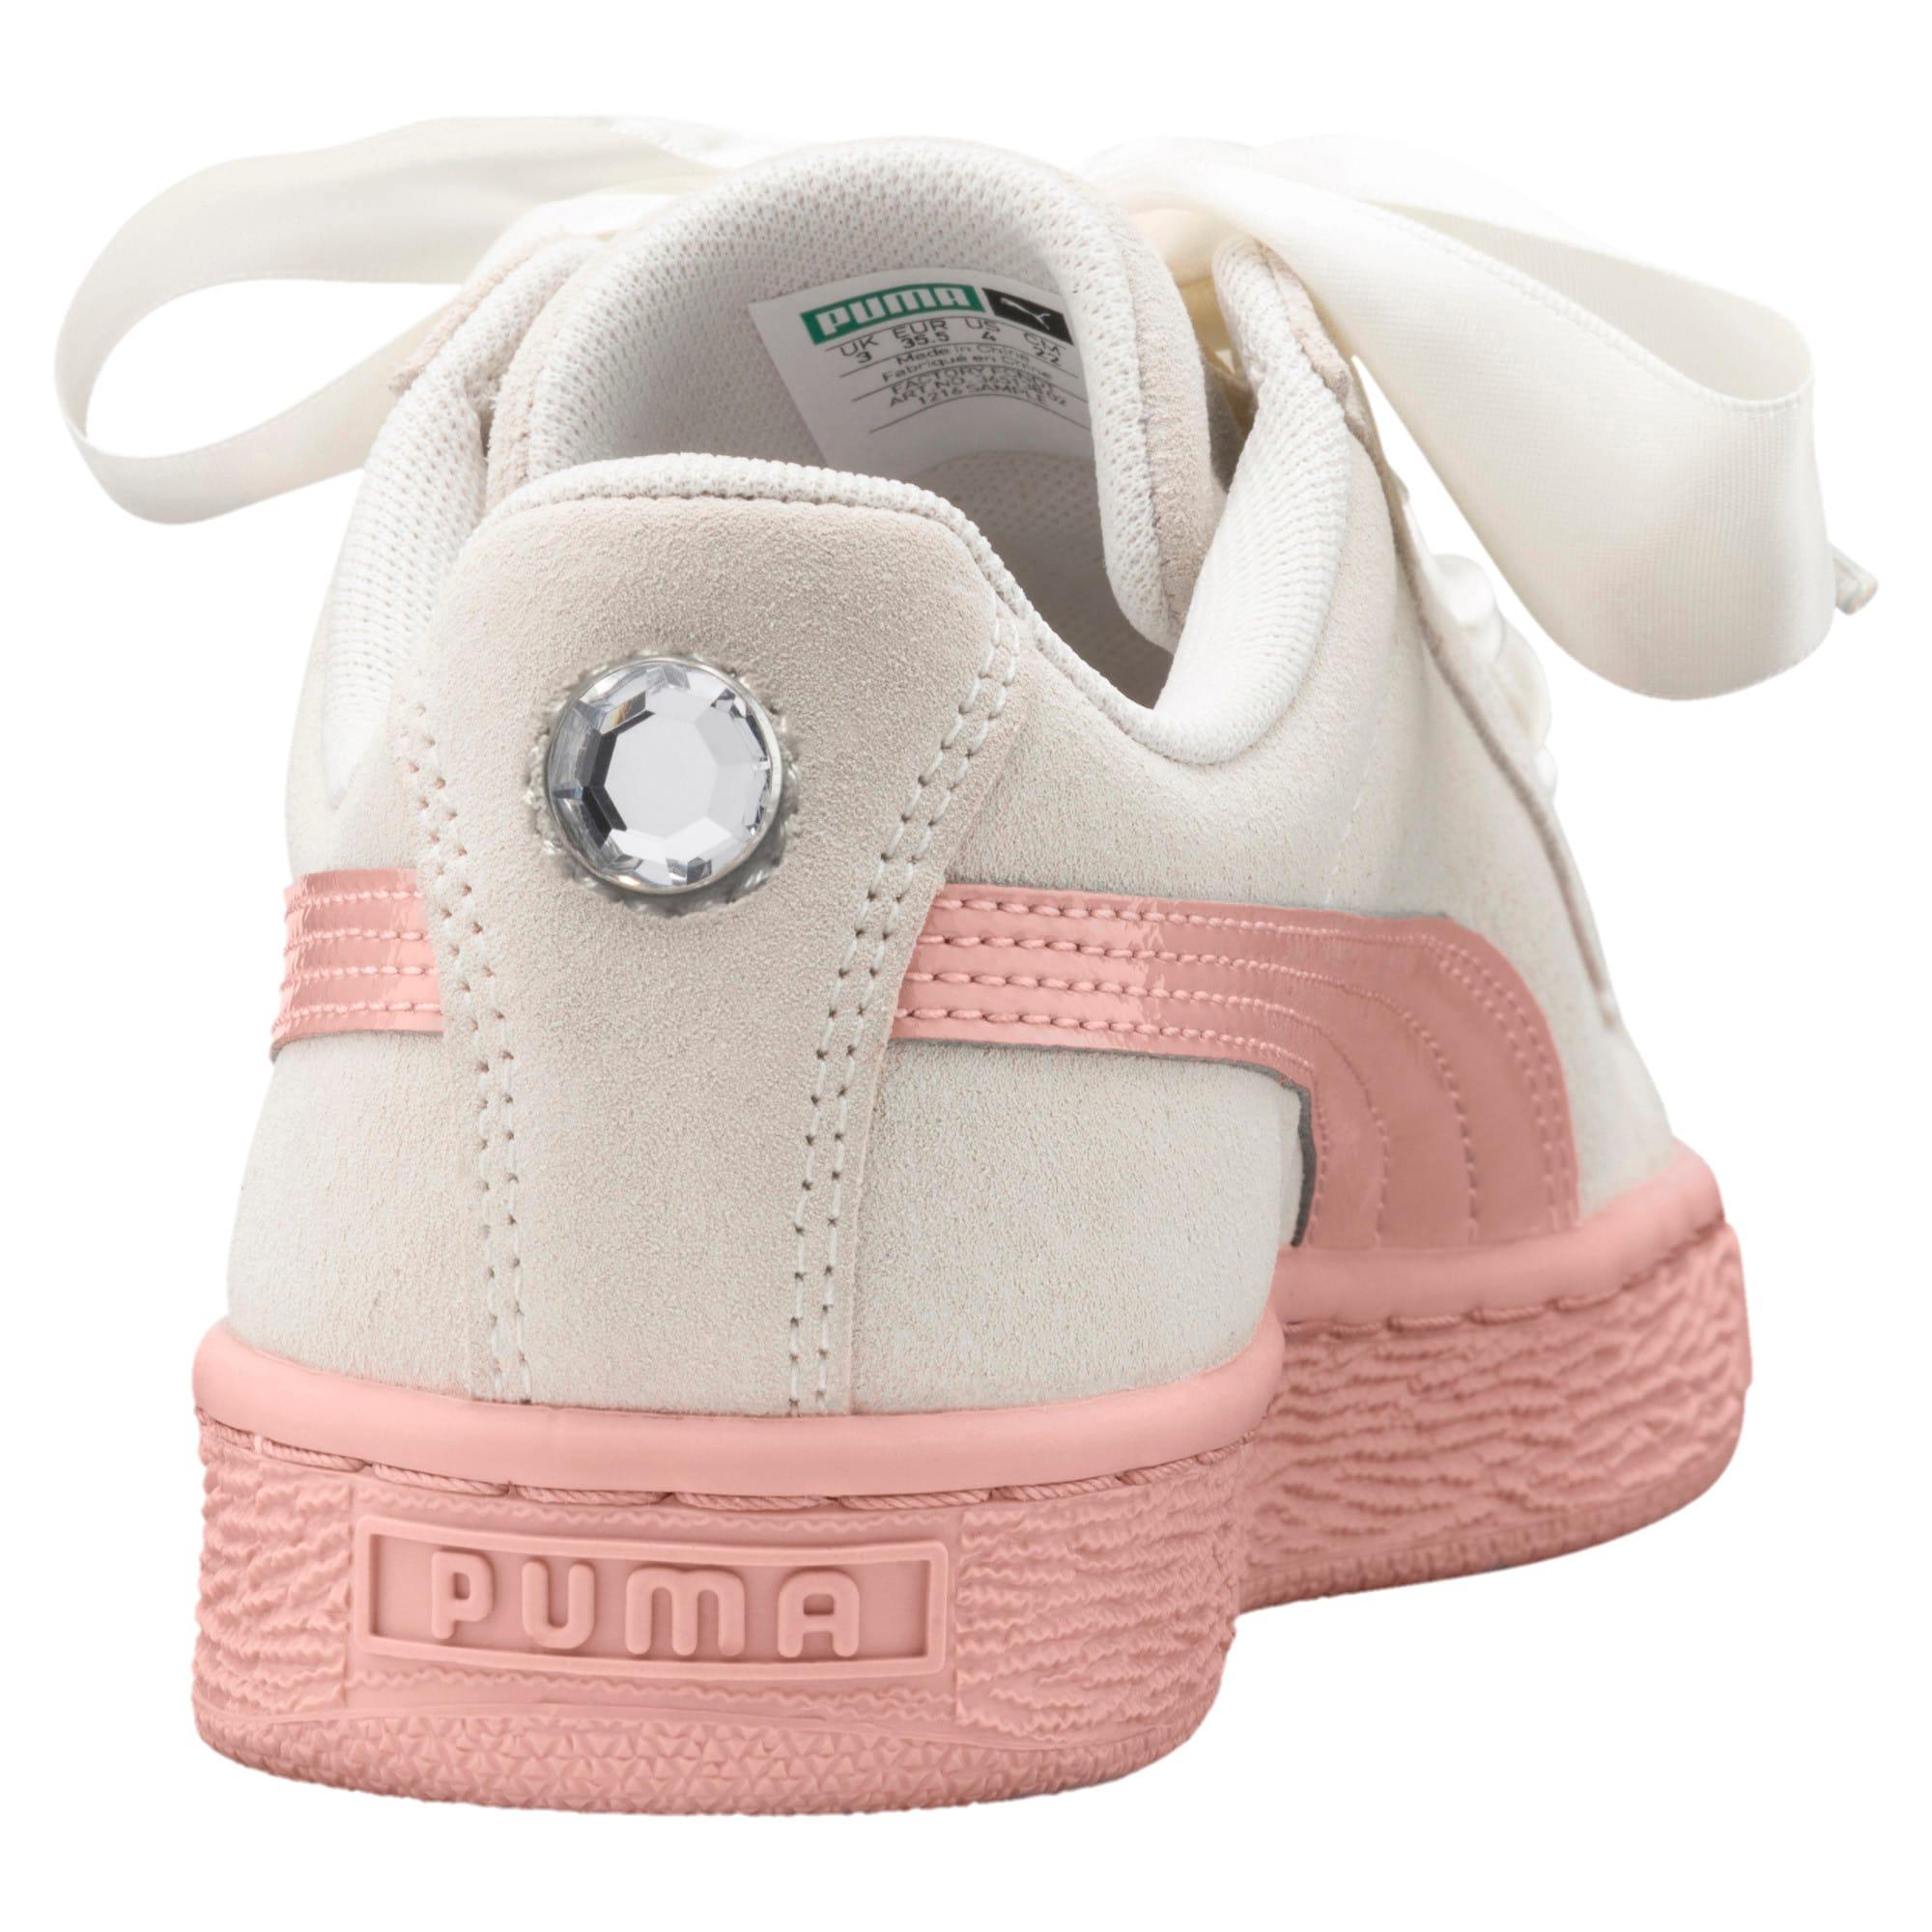 Thumbnail 4 of Suede Heart Jewel Sneakers JR, Whisper White-Peach Beige, medium